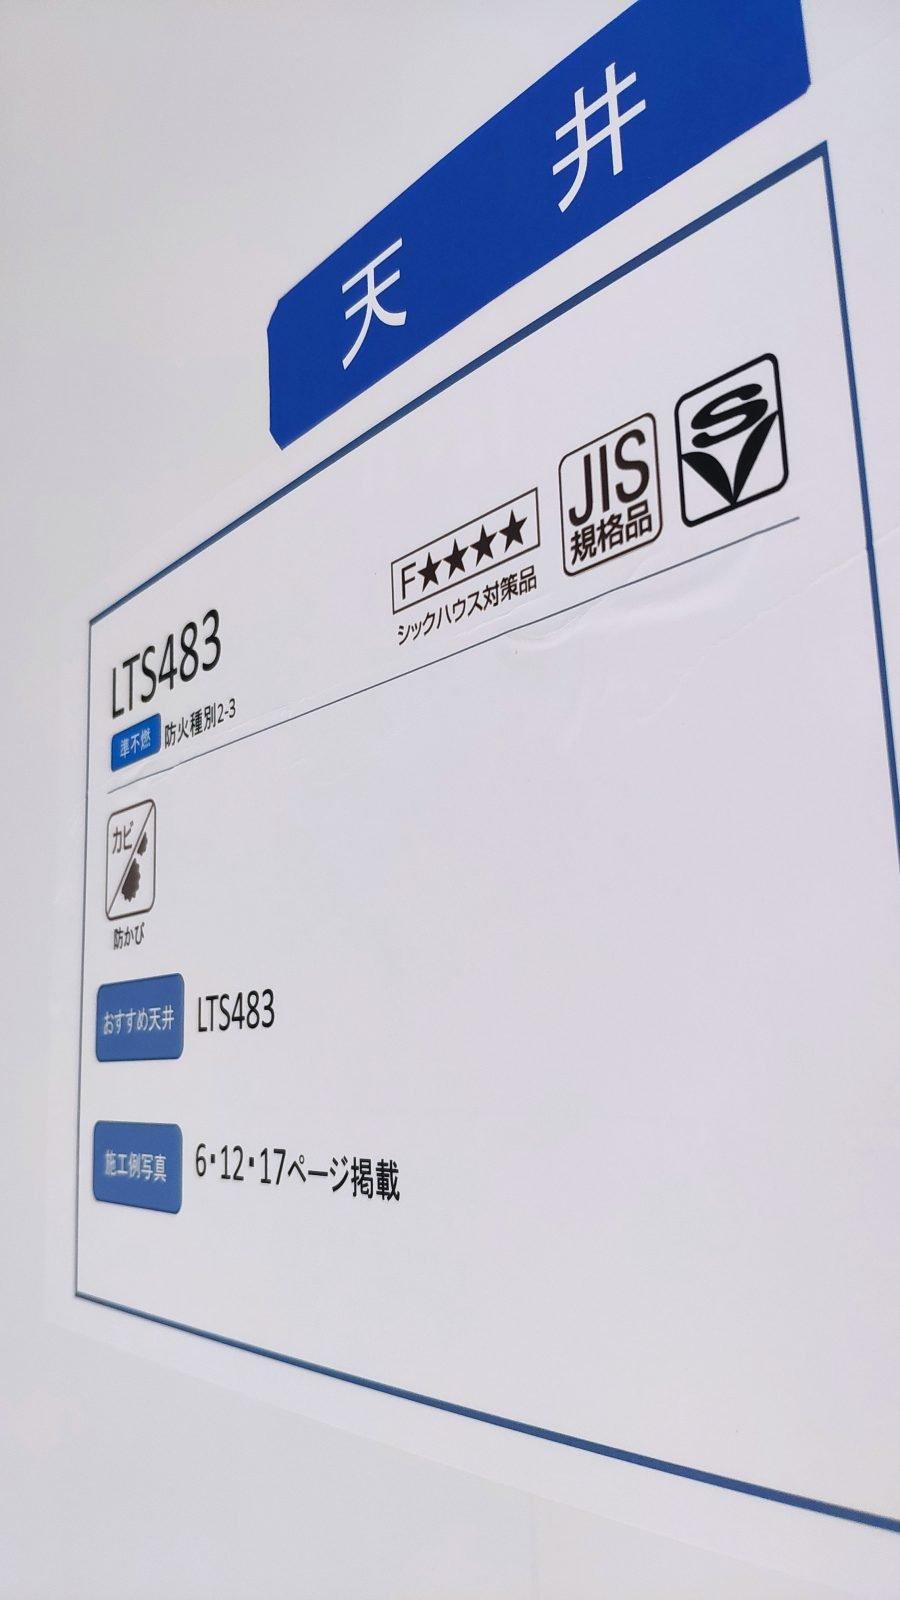 LTS483